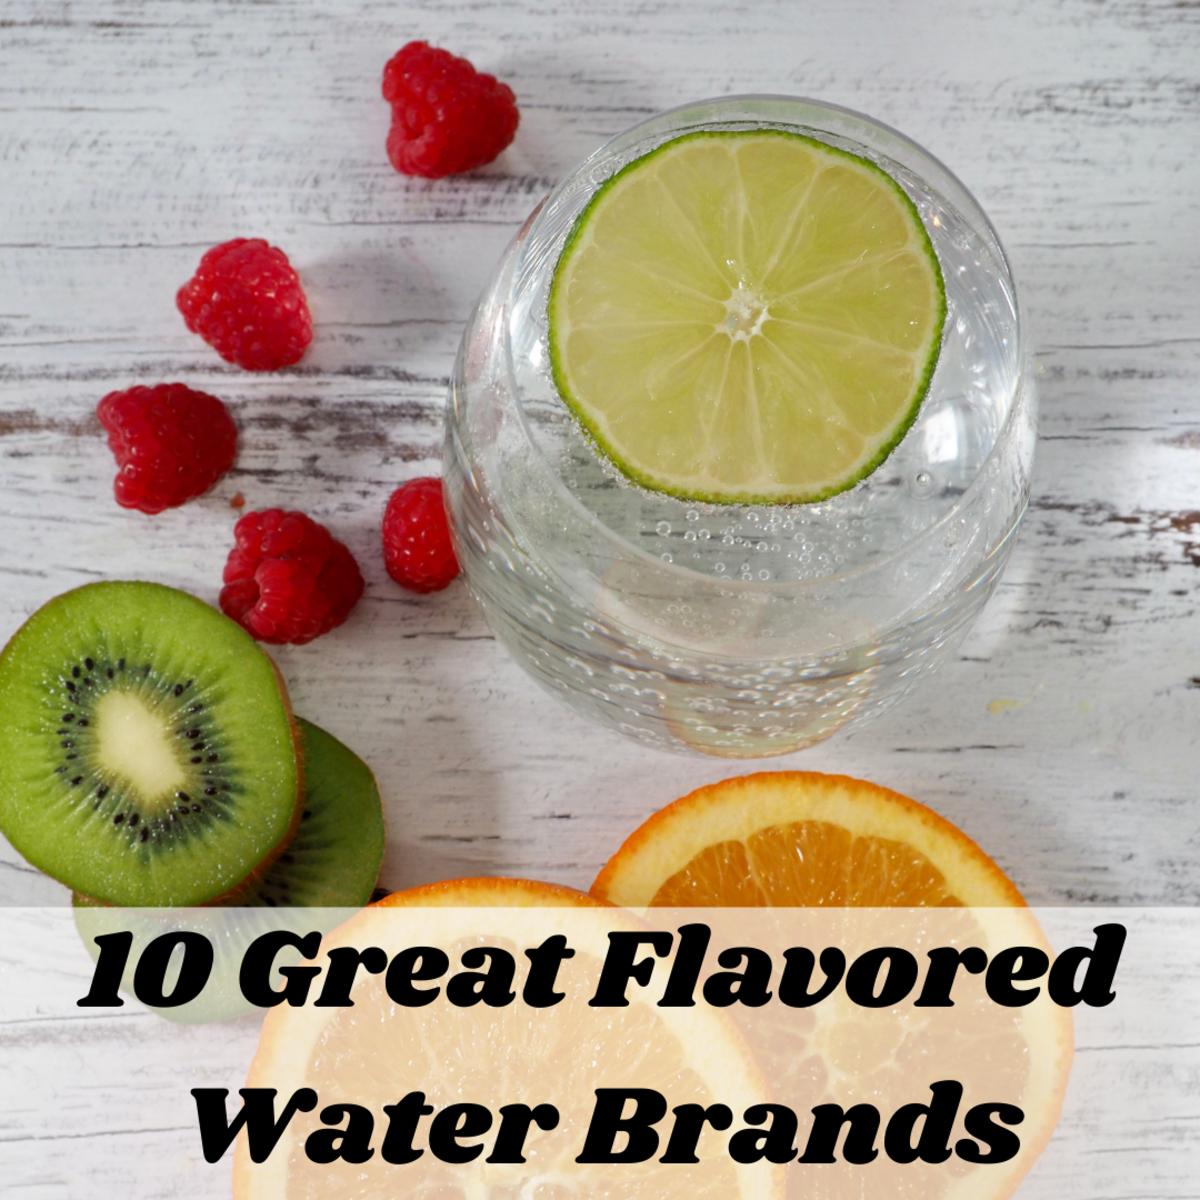 Top 10 Brands of Flavored Water